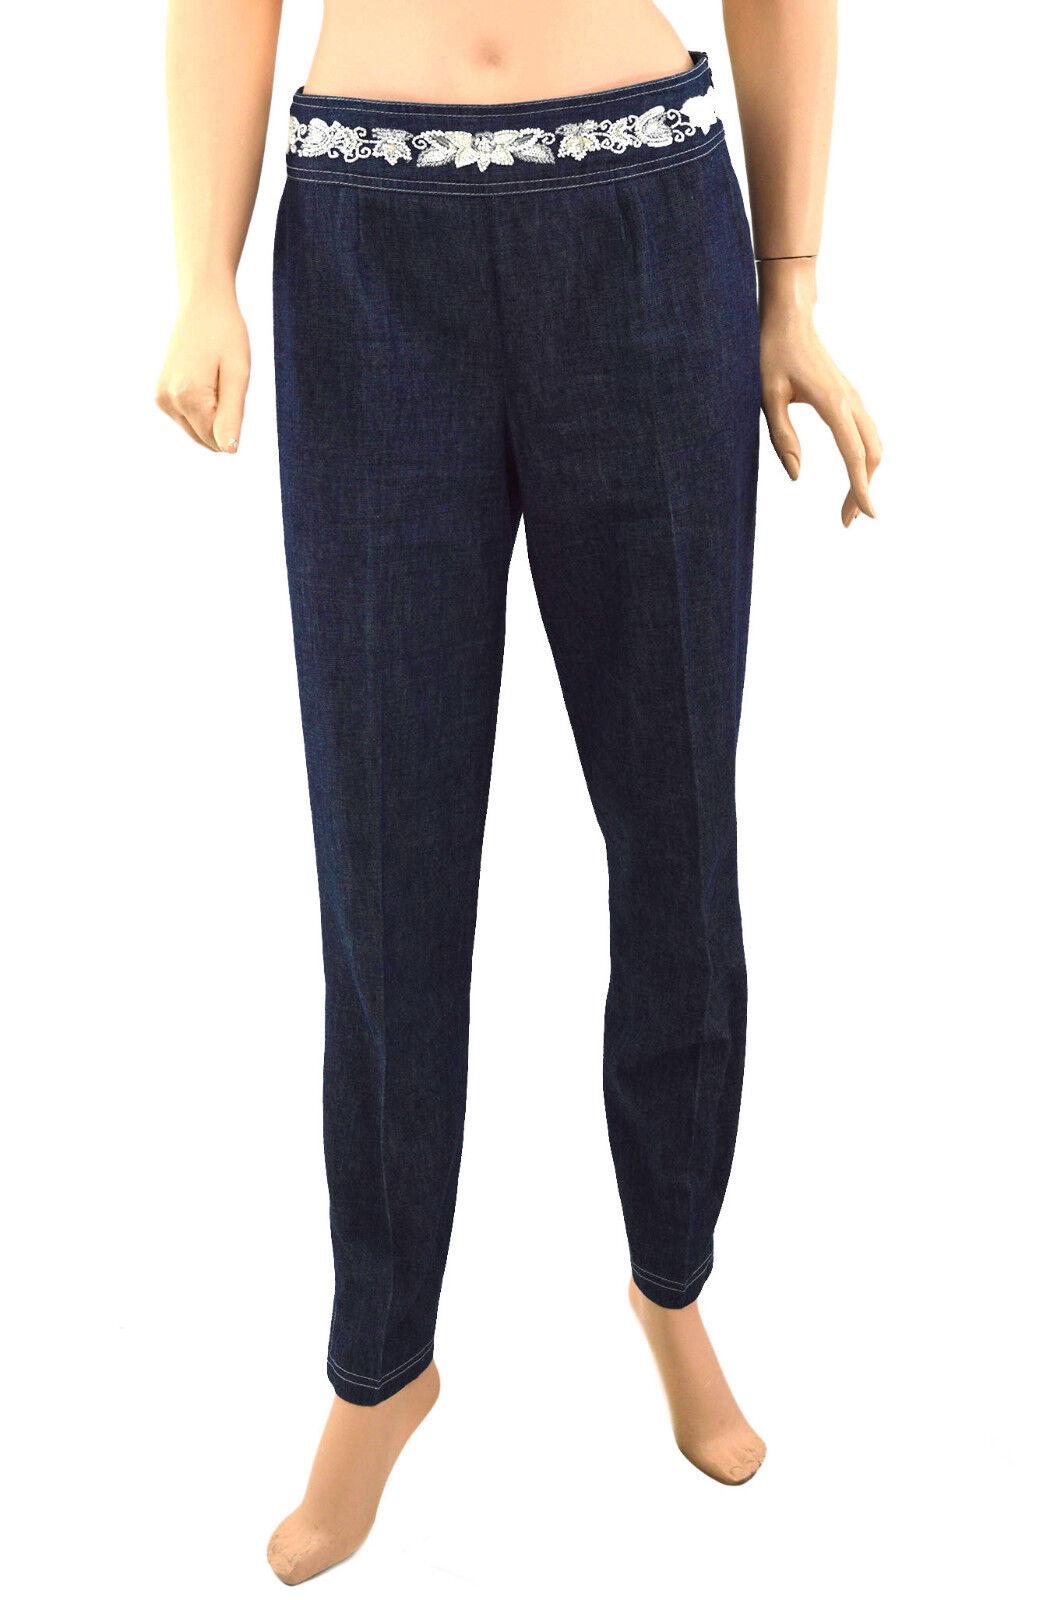 350 ESCADA Jeans bluee Sequin Womens Denim   US 4